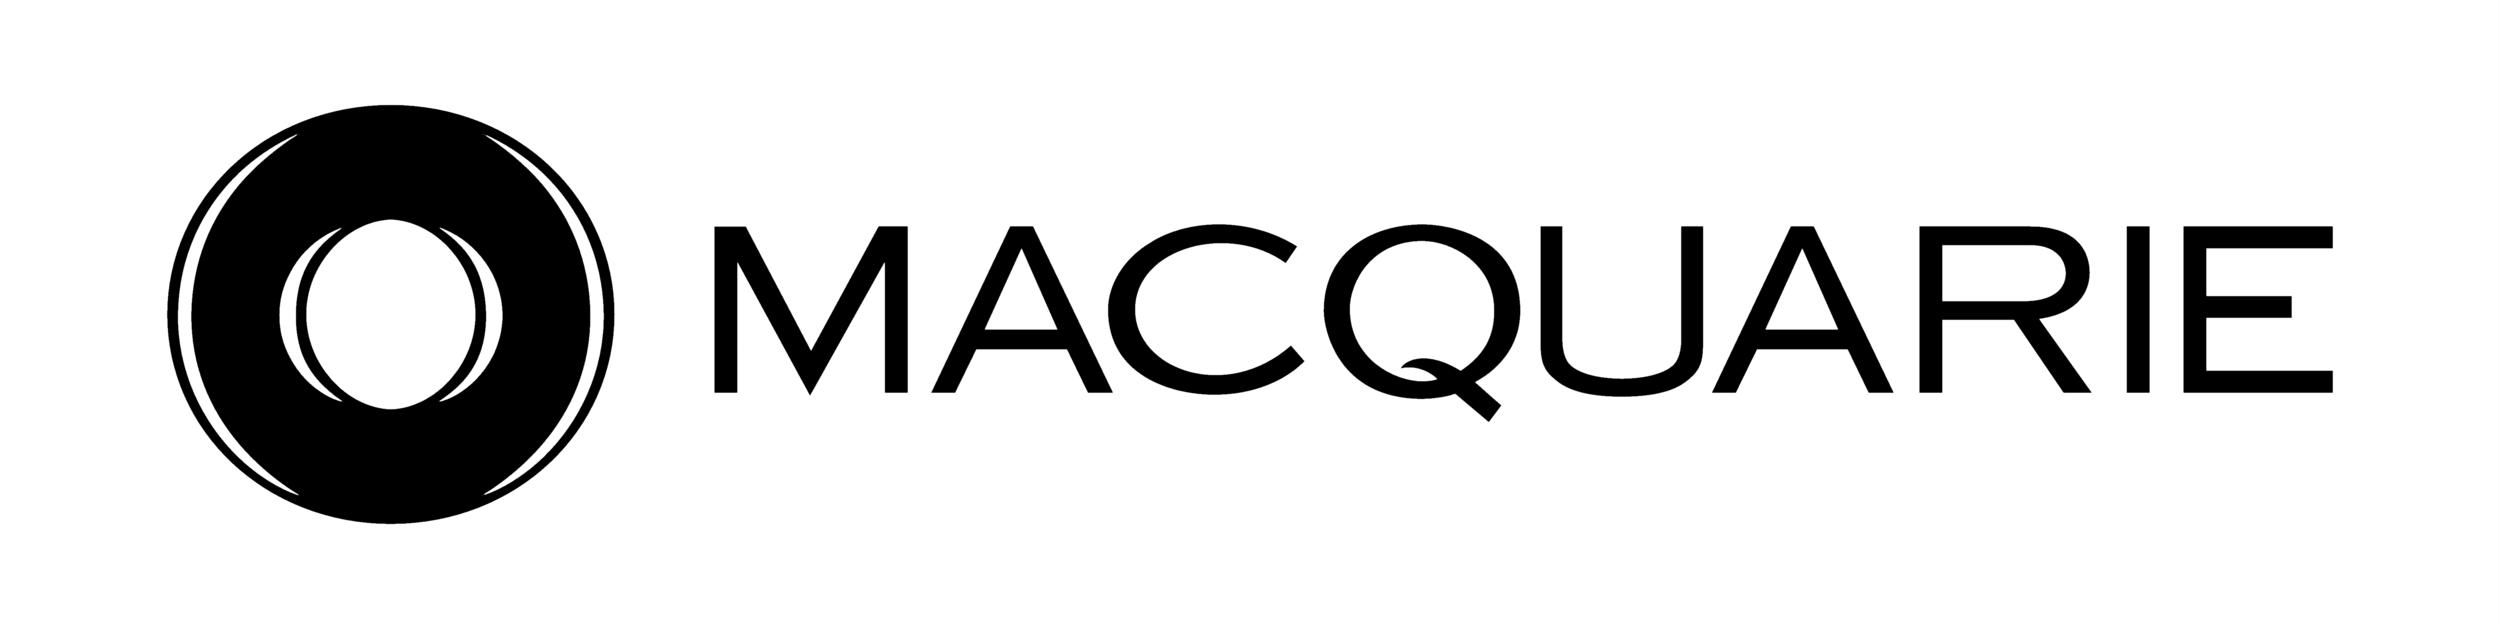 macquarie-logo-png-macquarie-group-macquarie-logo-6440.png